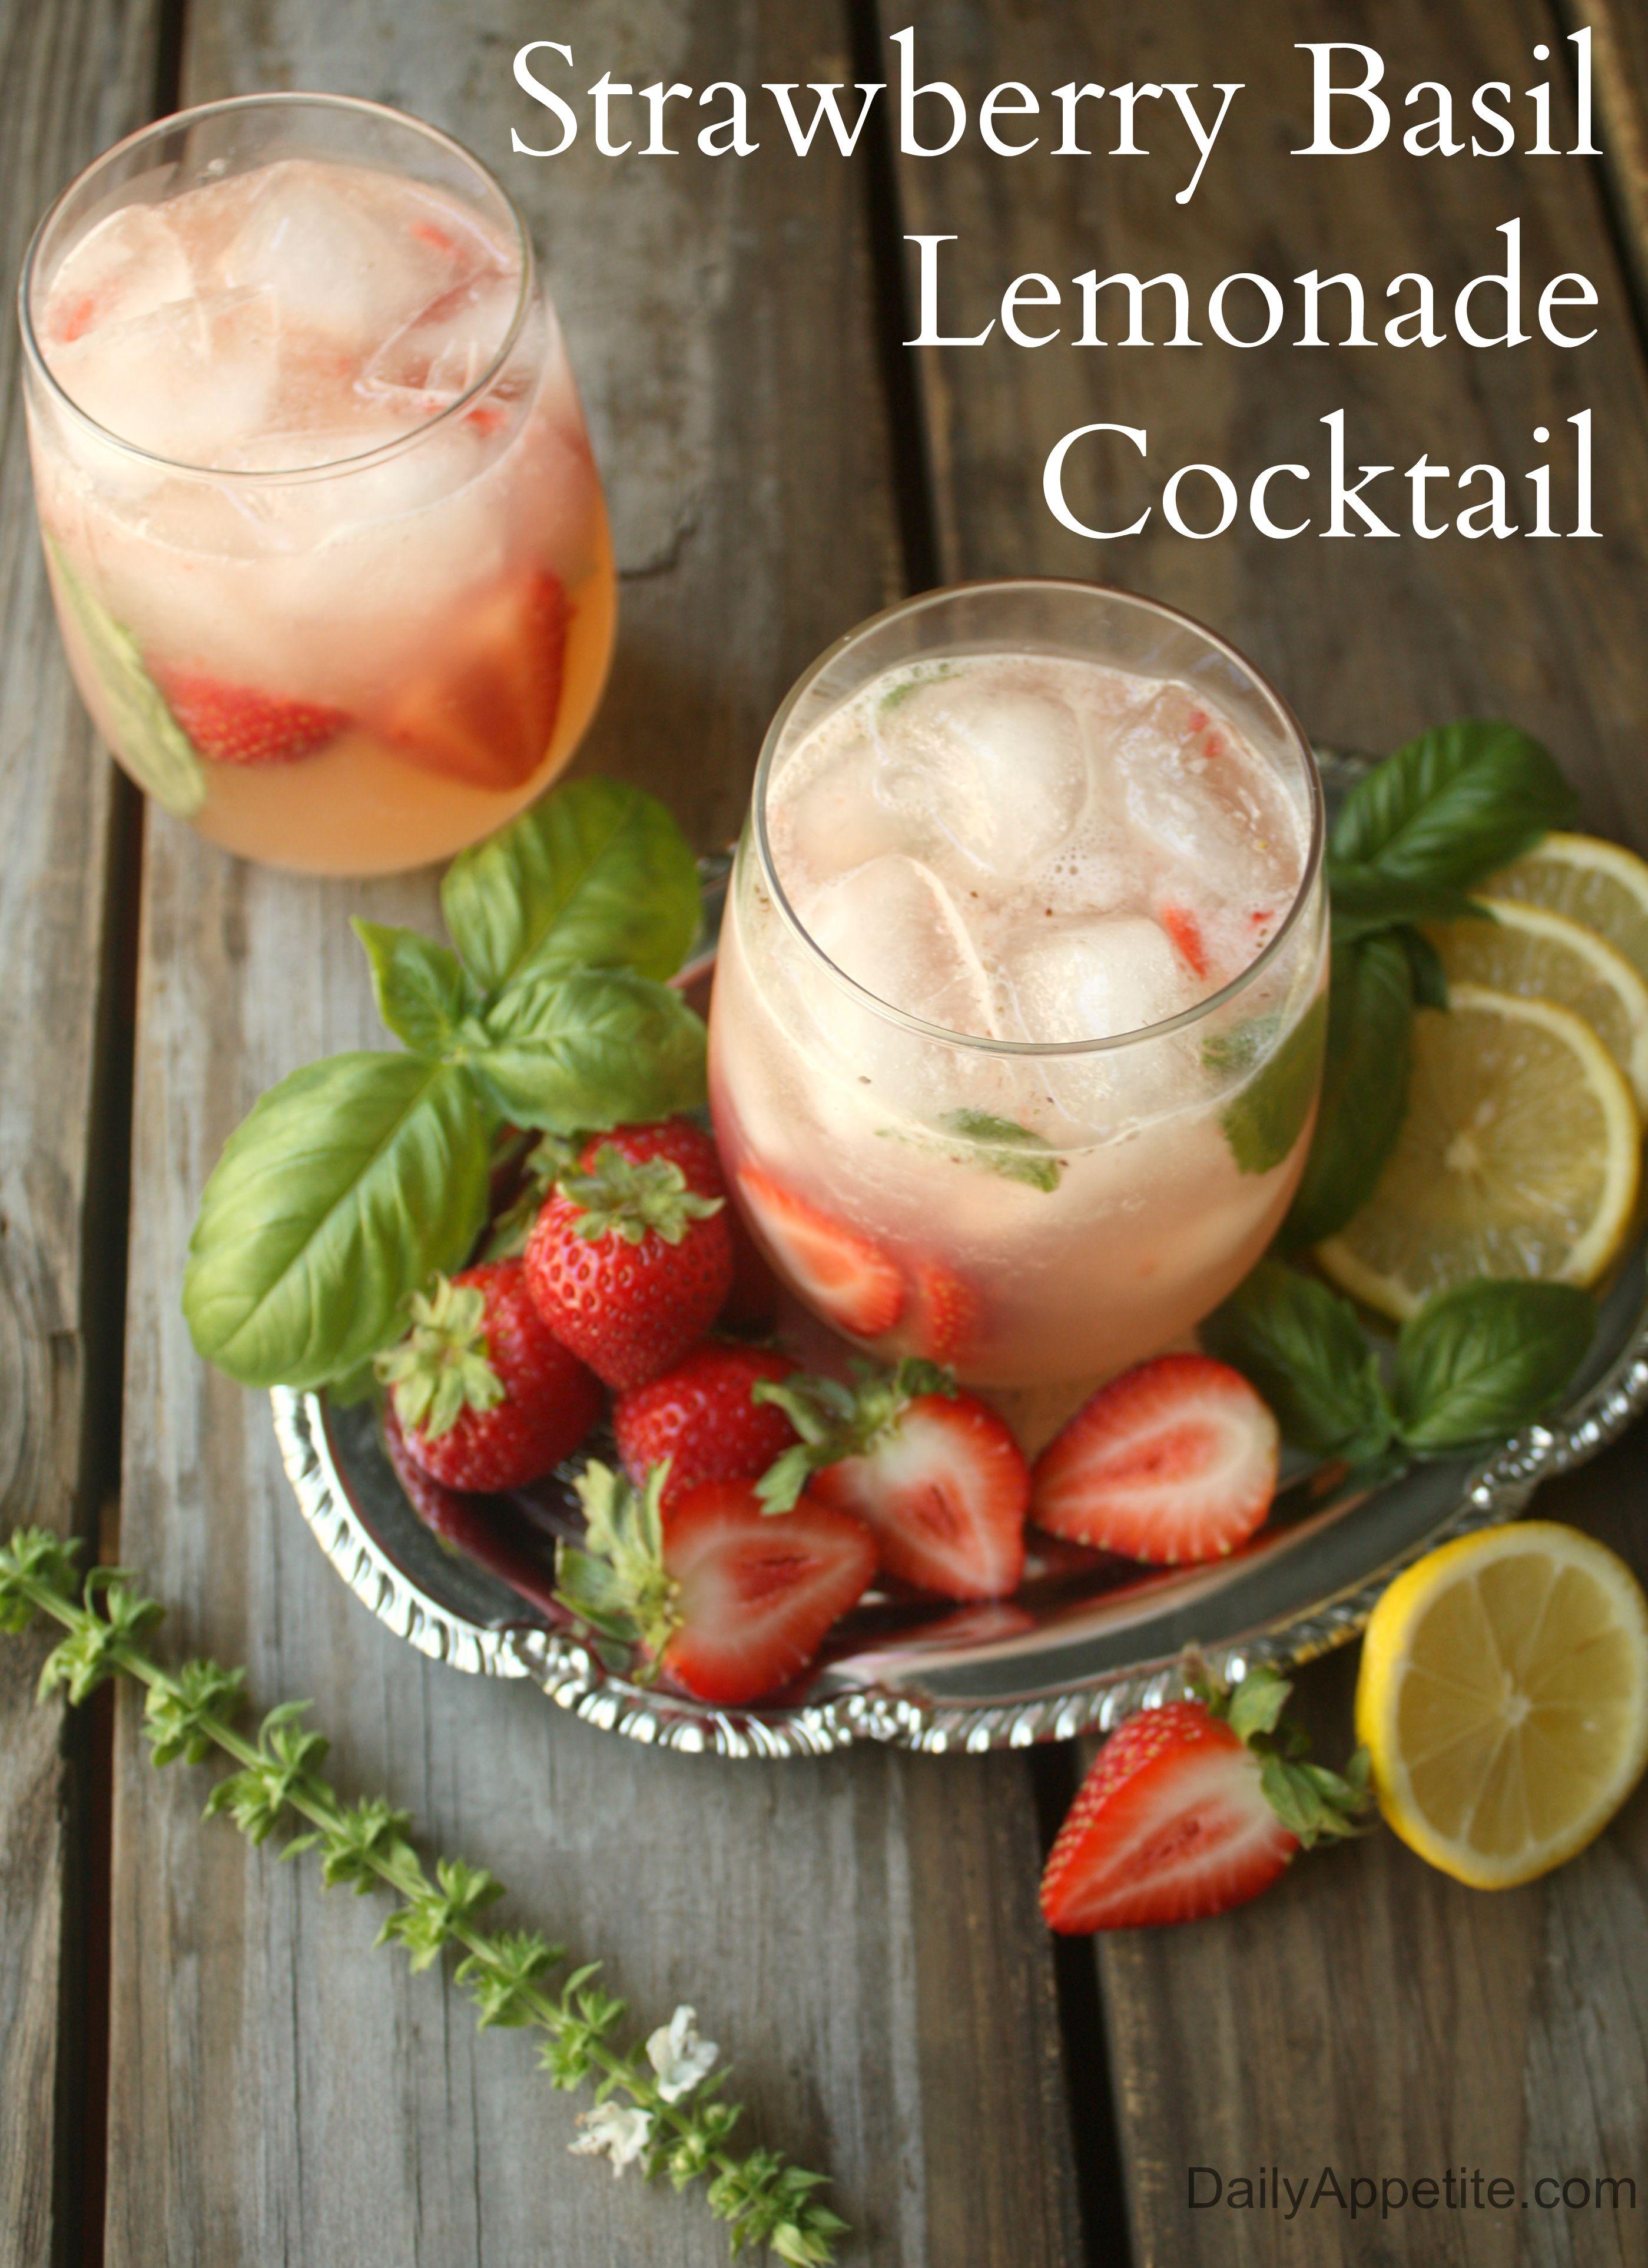 Strawberry Basil Lemondae Cocktail made with Citron